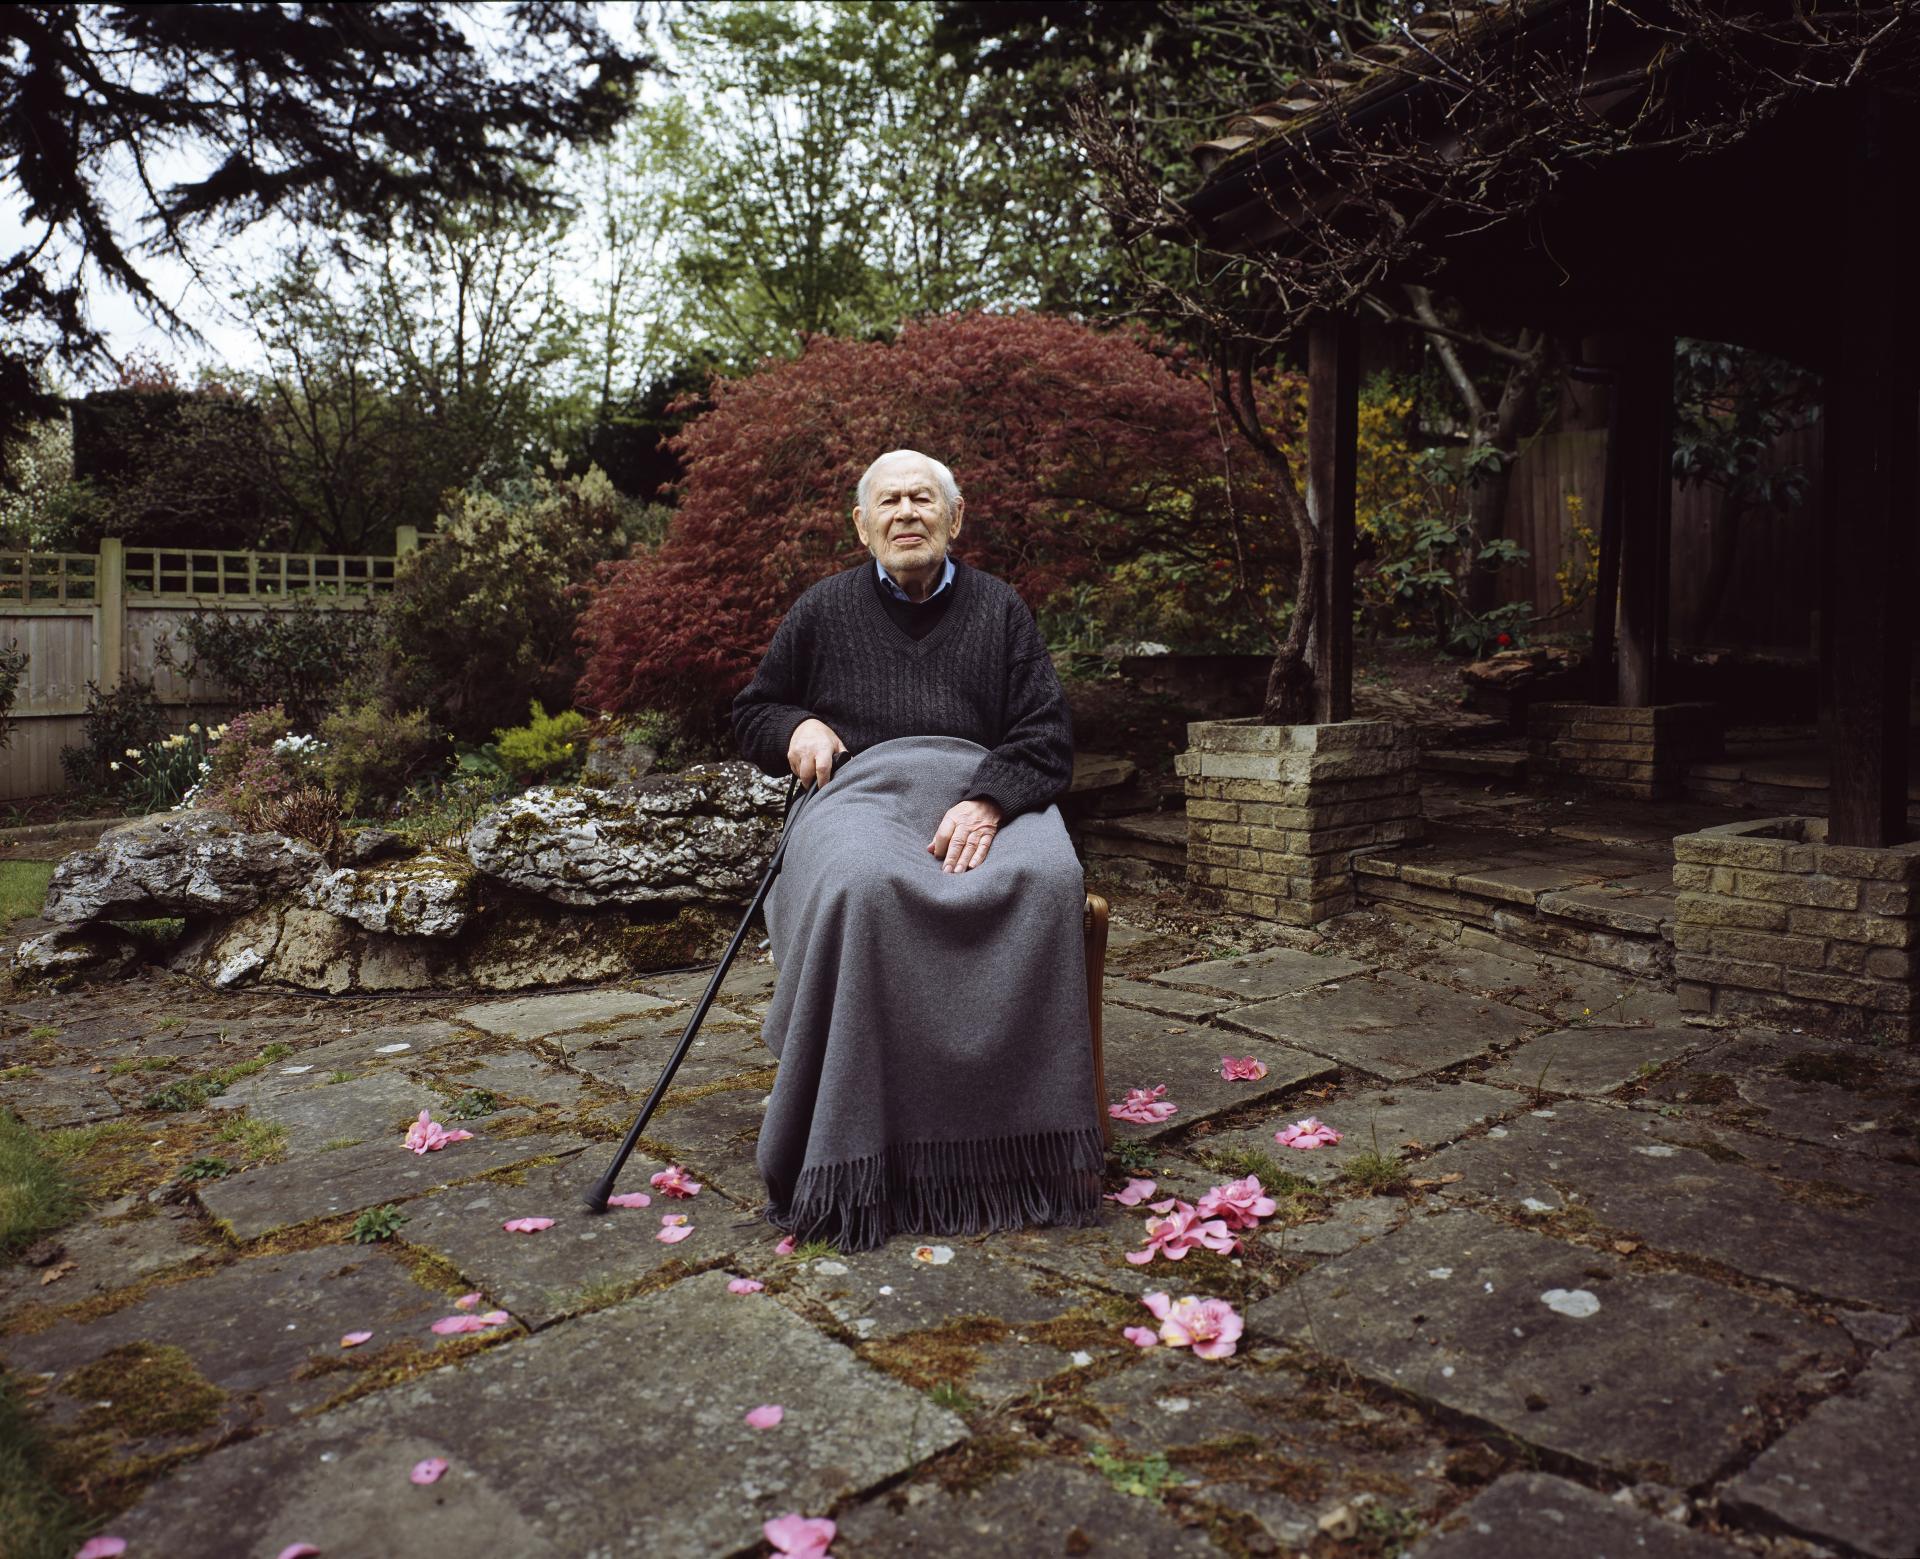 The Duchess of Cambridge's Holocaust Survivors portrait will go on Exhibition